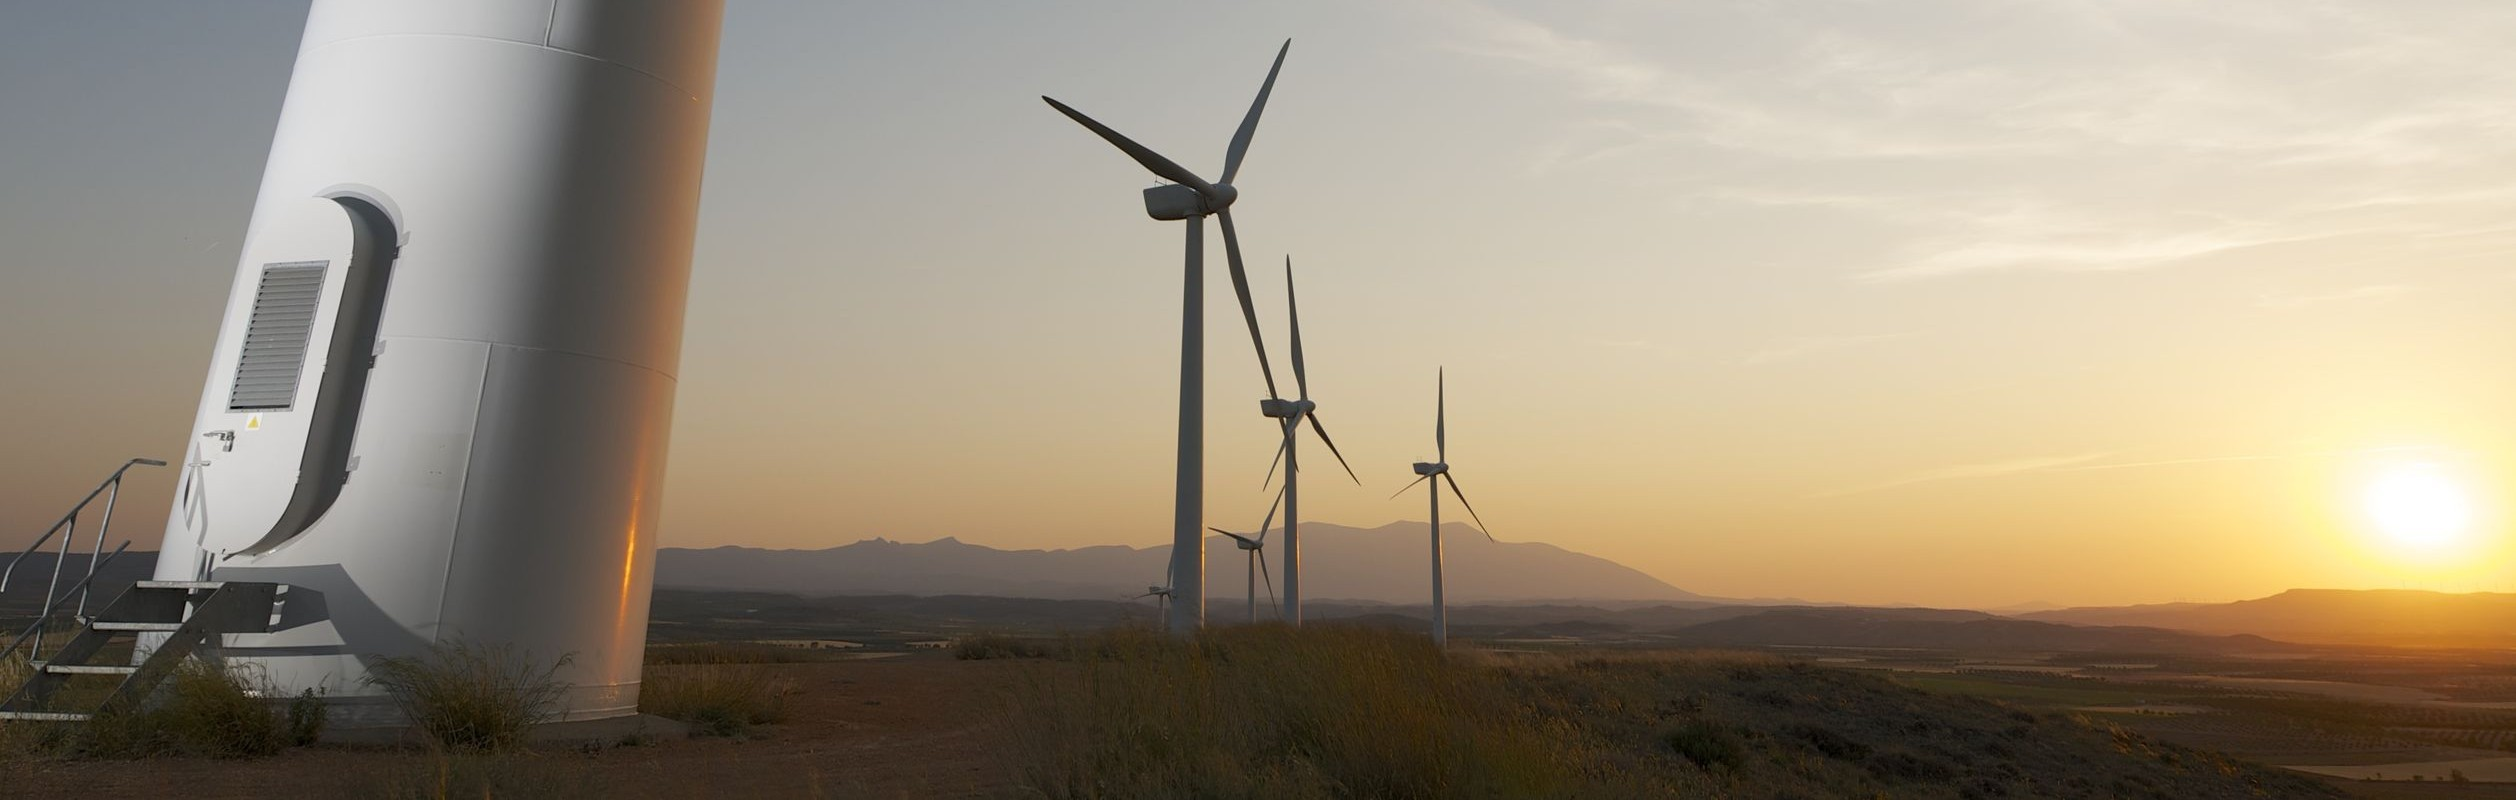 Rack Mounts for Wind Turbines